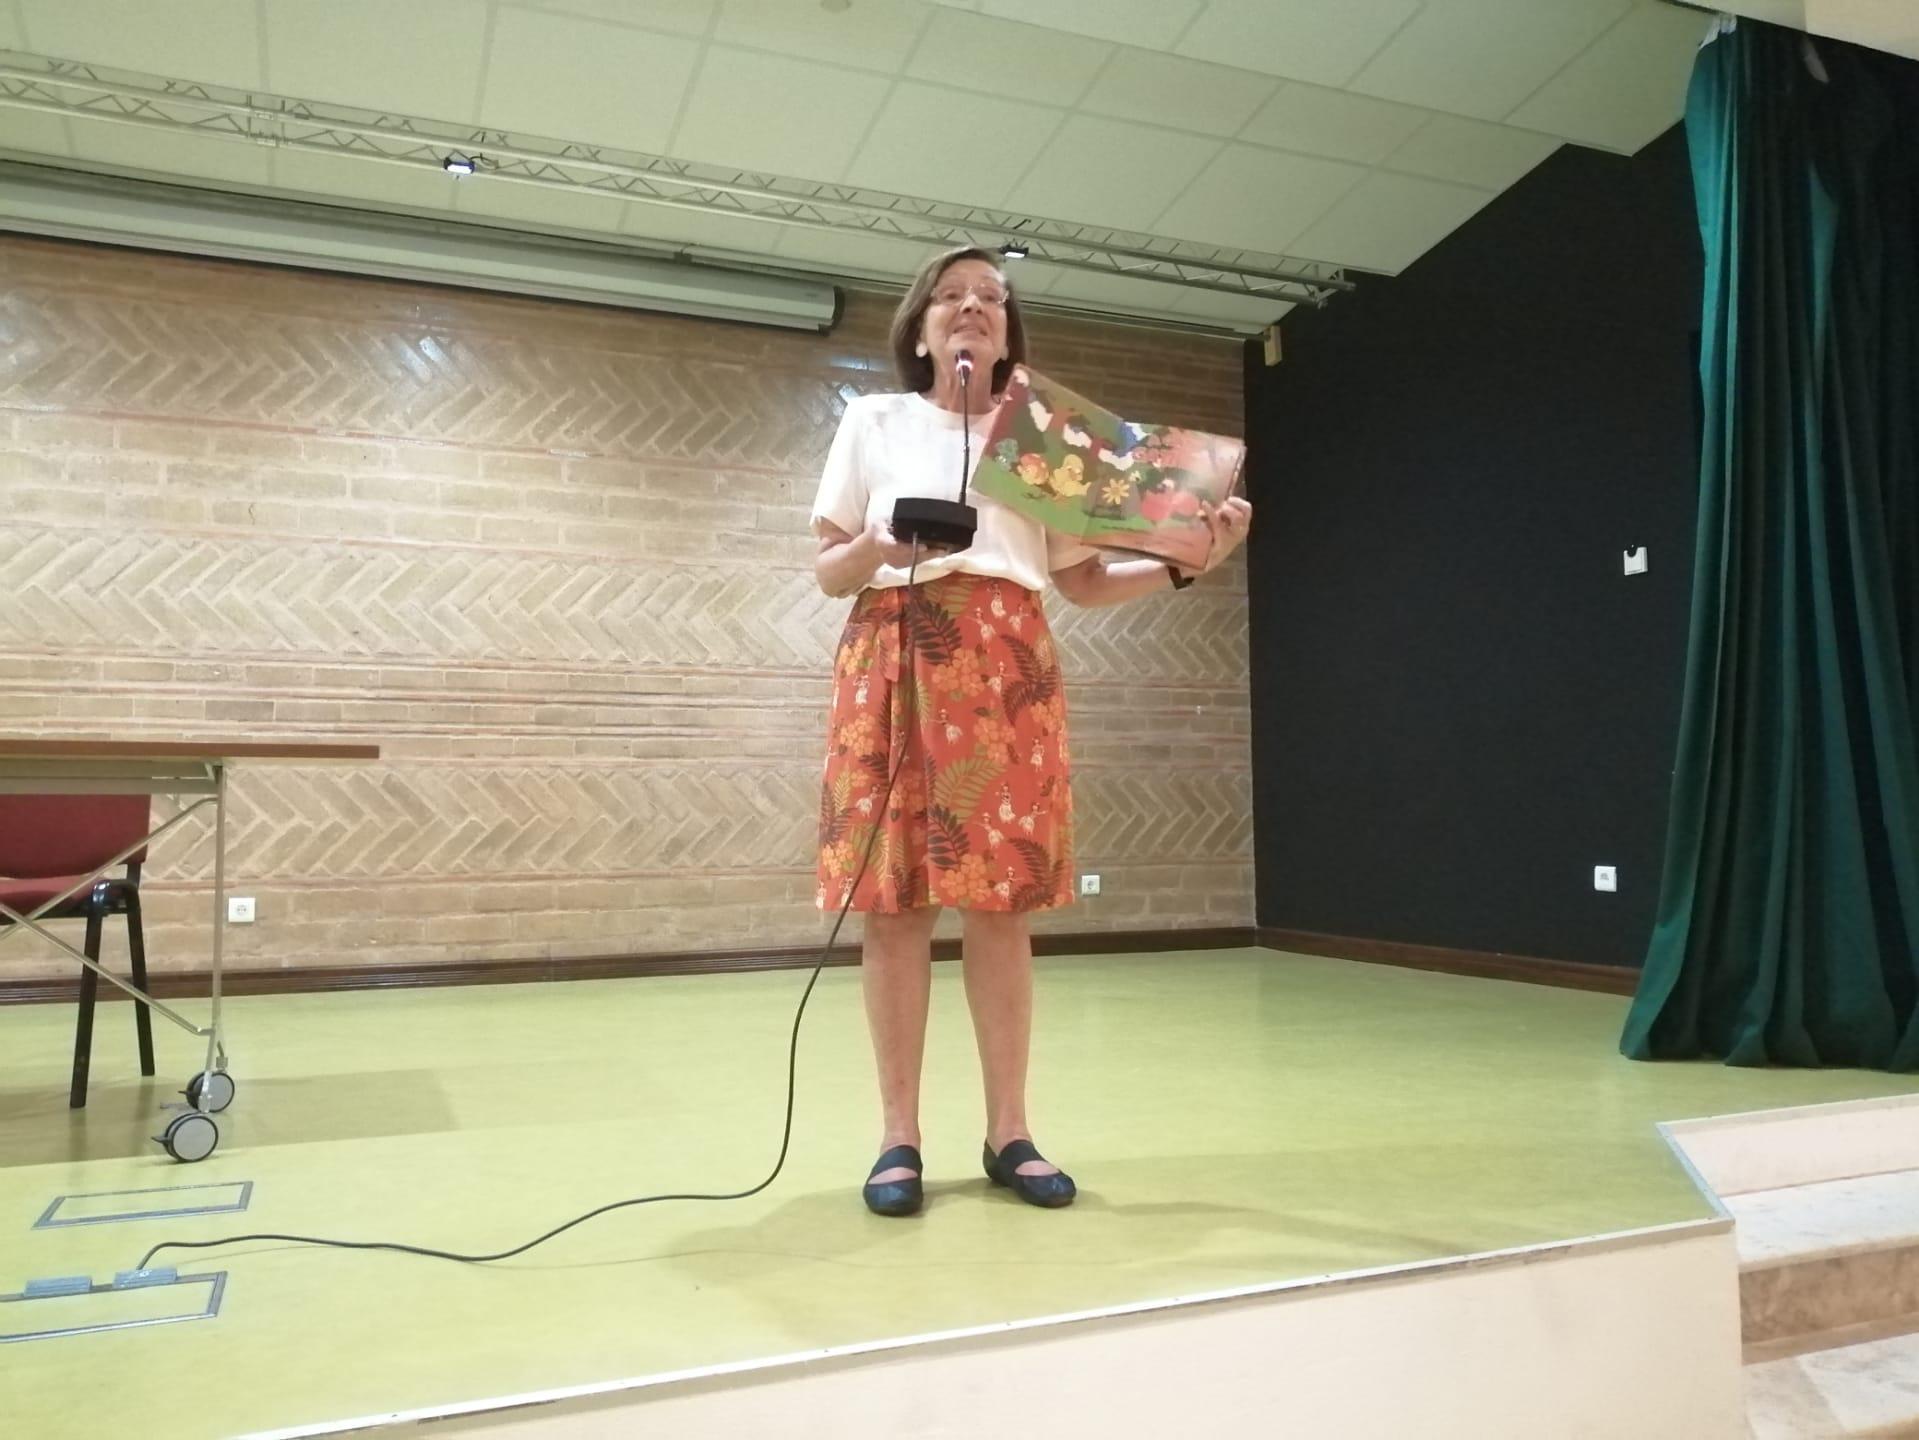 Visita da Escritora – Ana Maria Magalhães